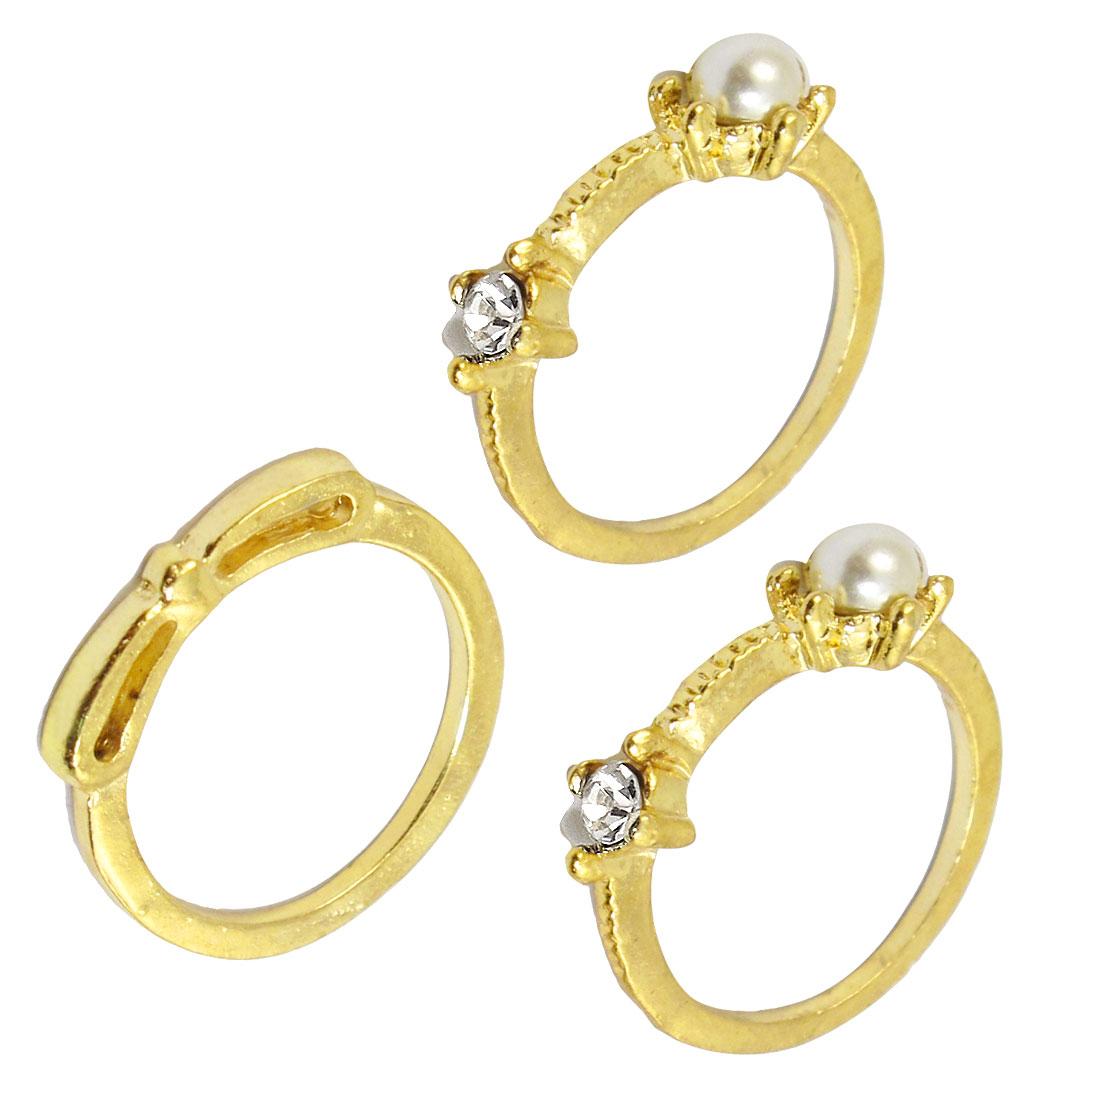 3 Pcs Women Golden Tone Round Faux Pearl Decor Finger Ring US 5 1/4